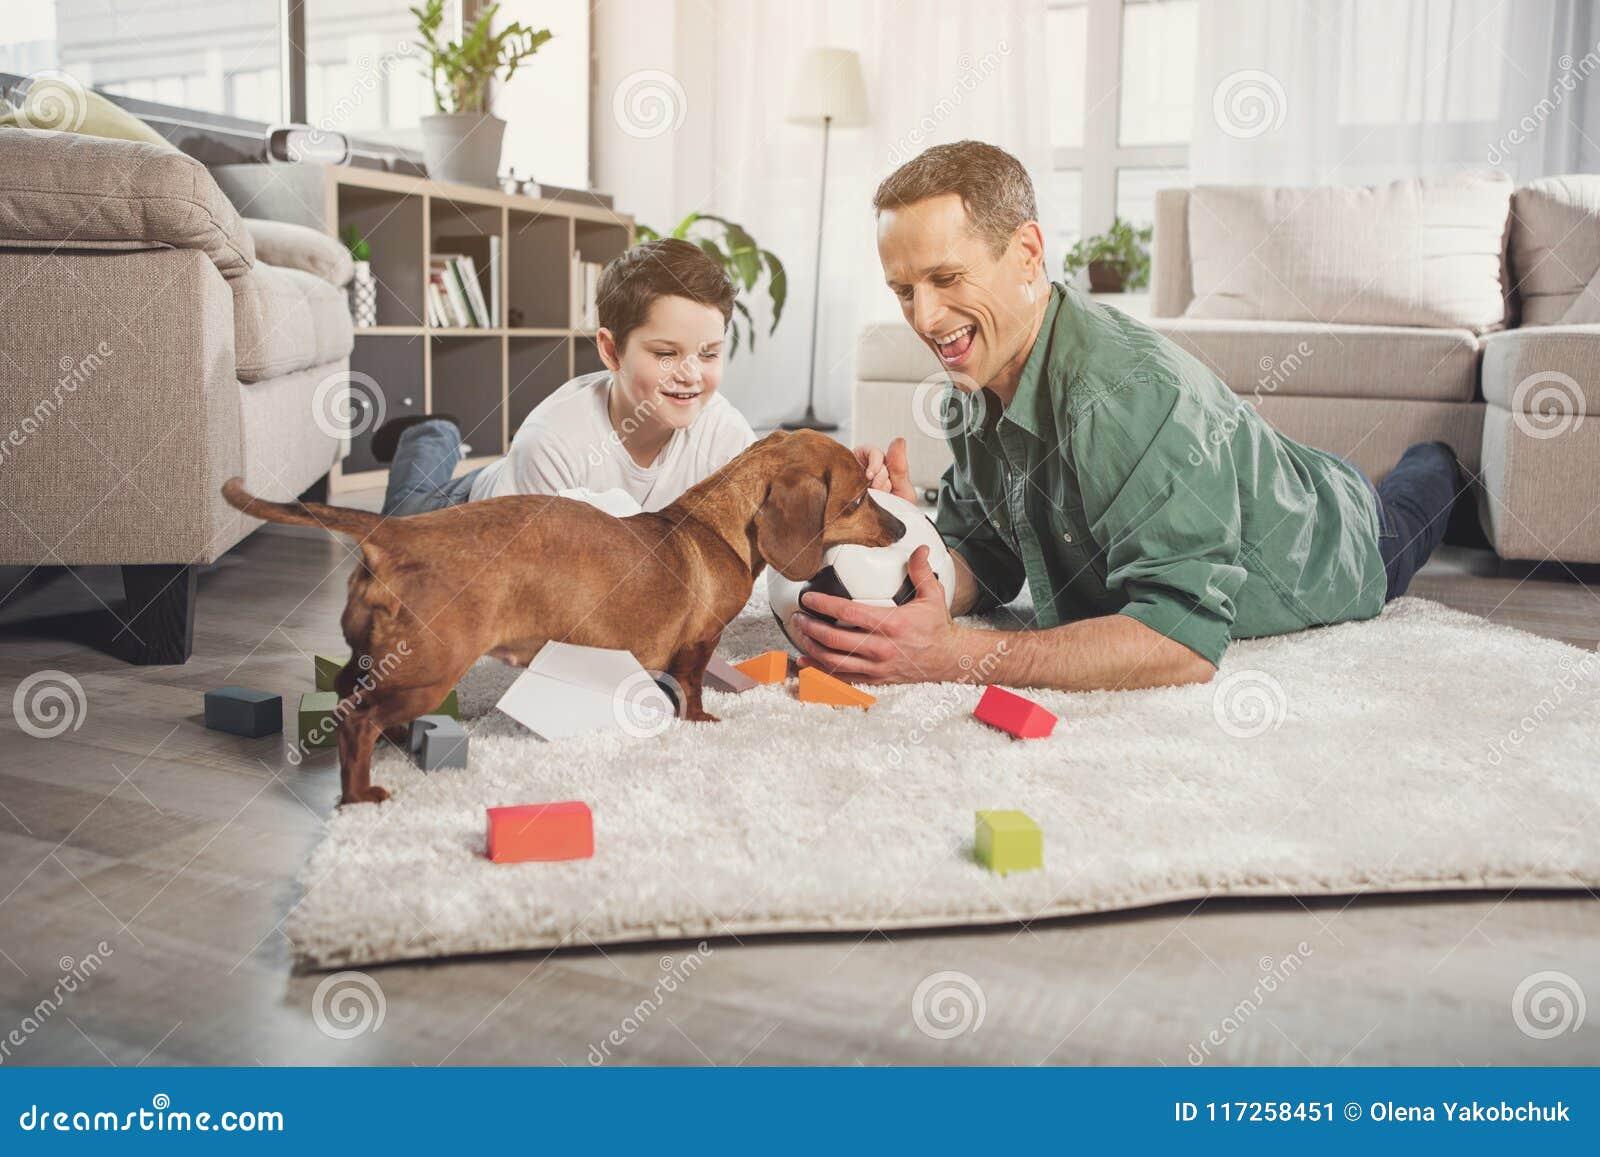 Blije papa en zoons speelvoetbal met puppy